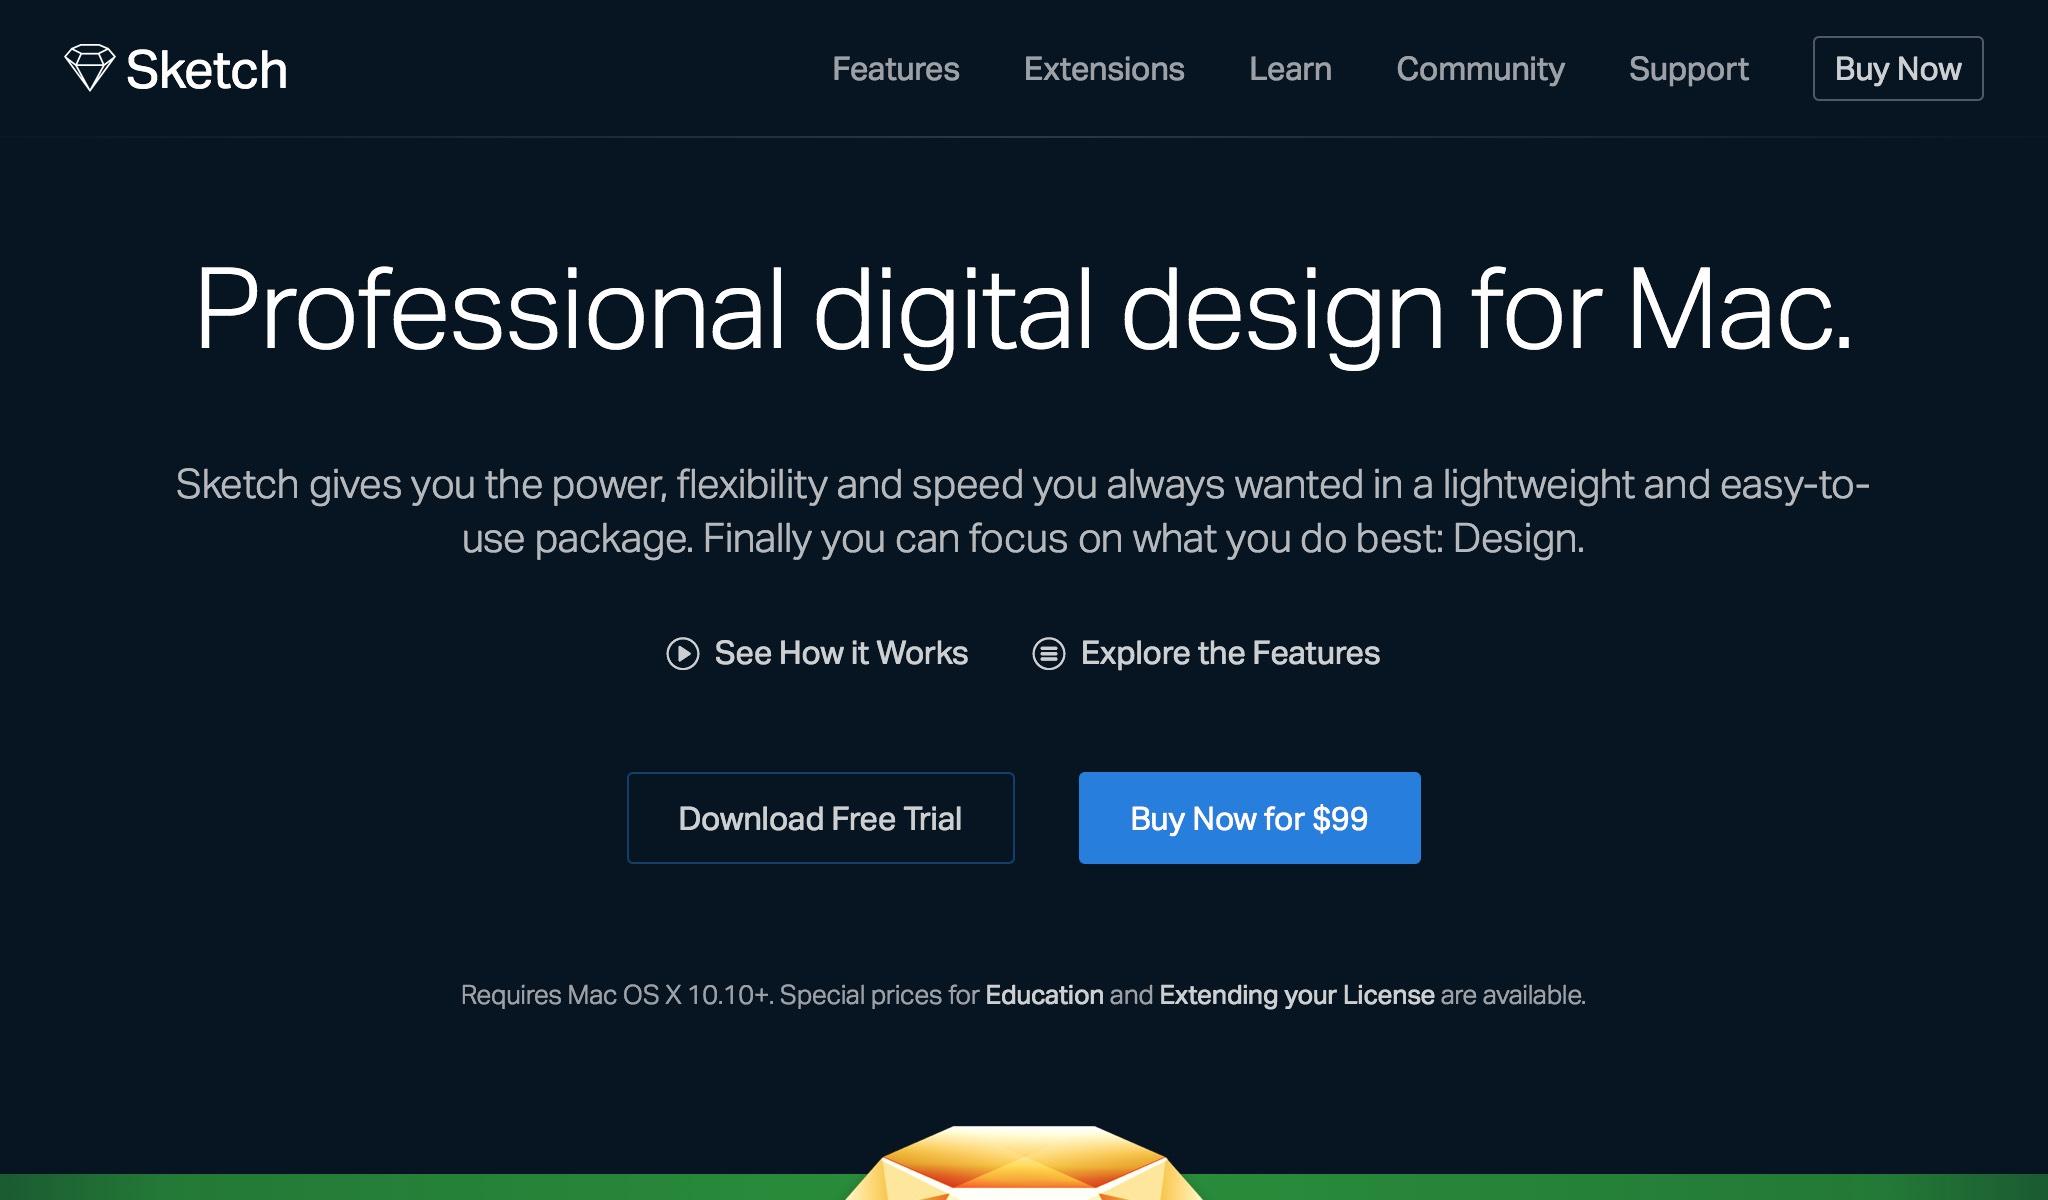 Sketch - Professional Digital Design for Mac